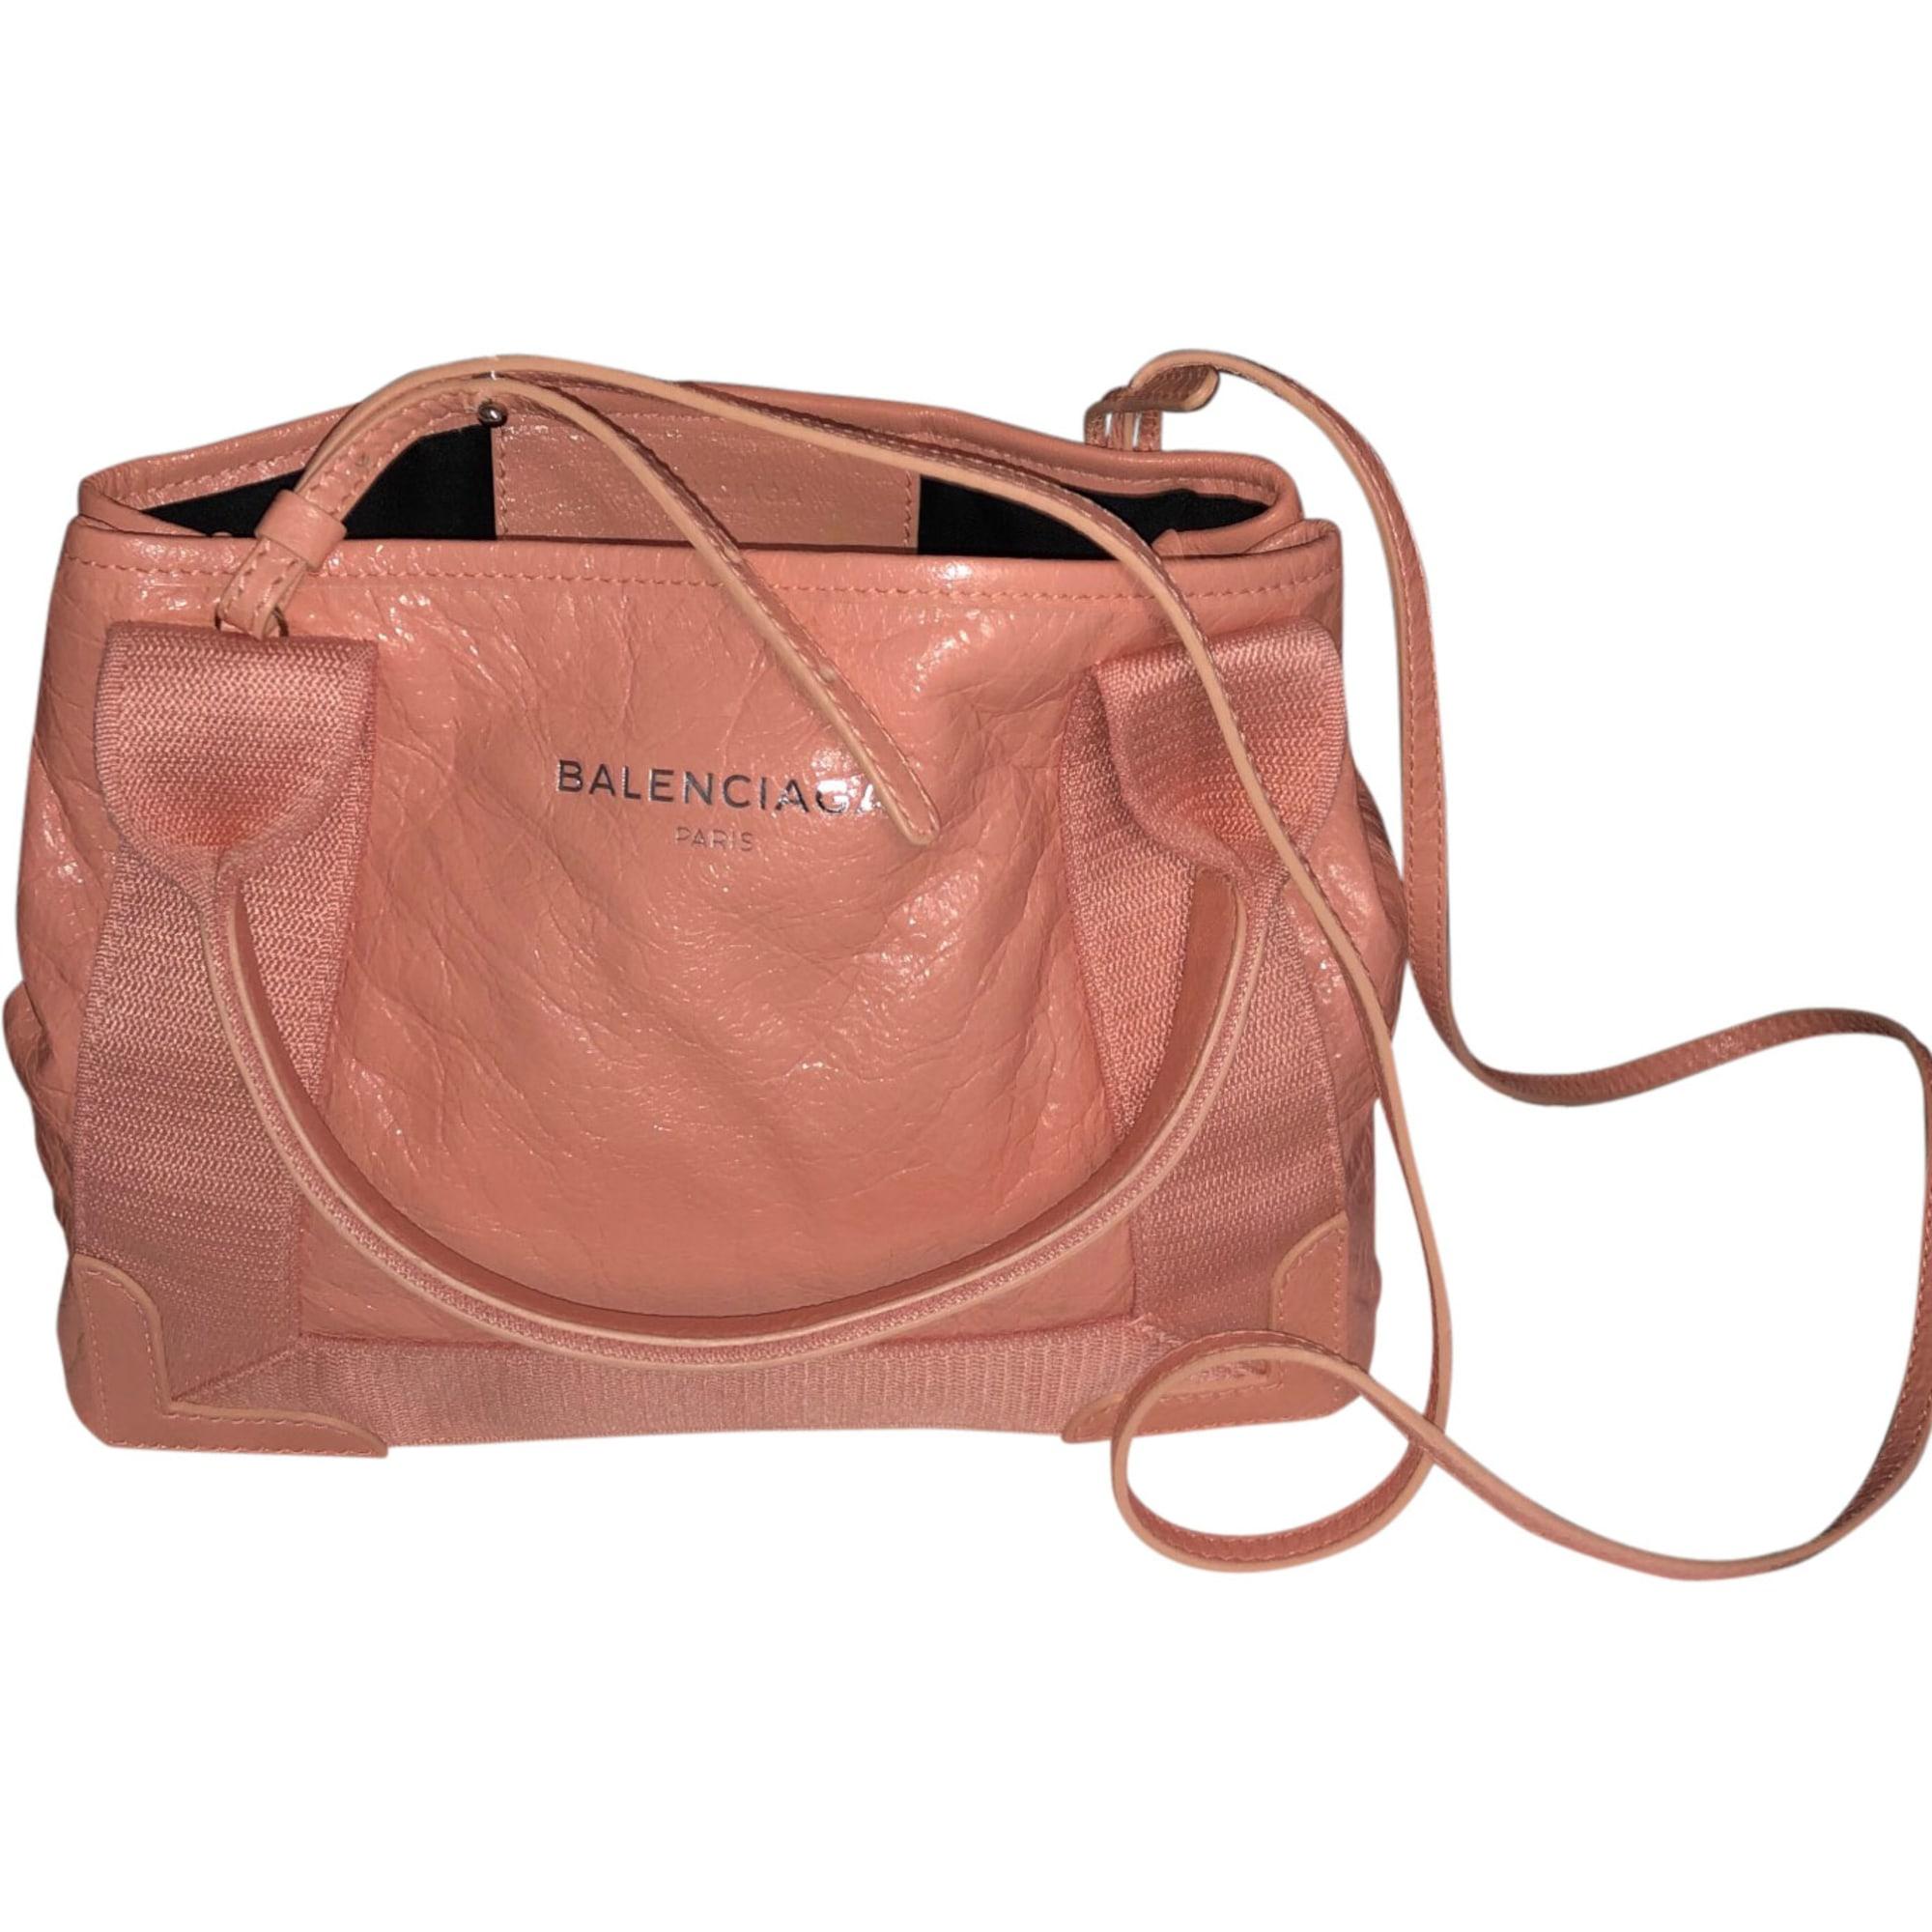 Leather Shoulder Bag BALENCIAGA Pink, fuchsia, light pink